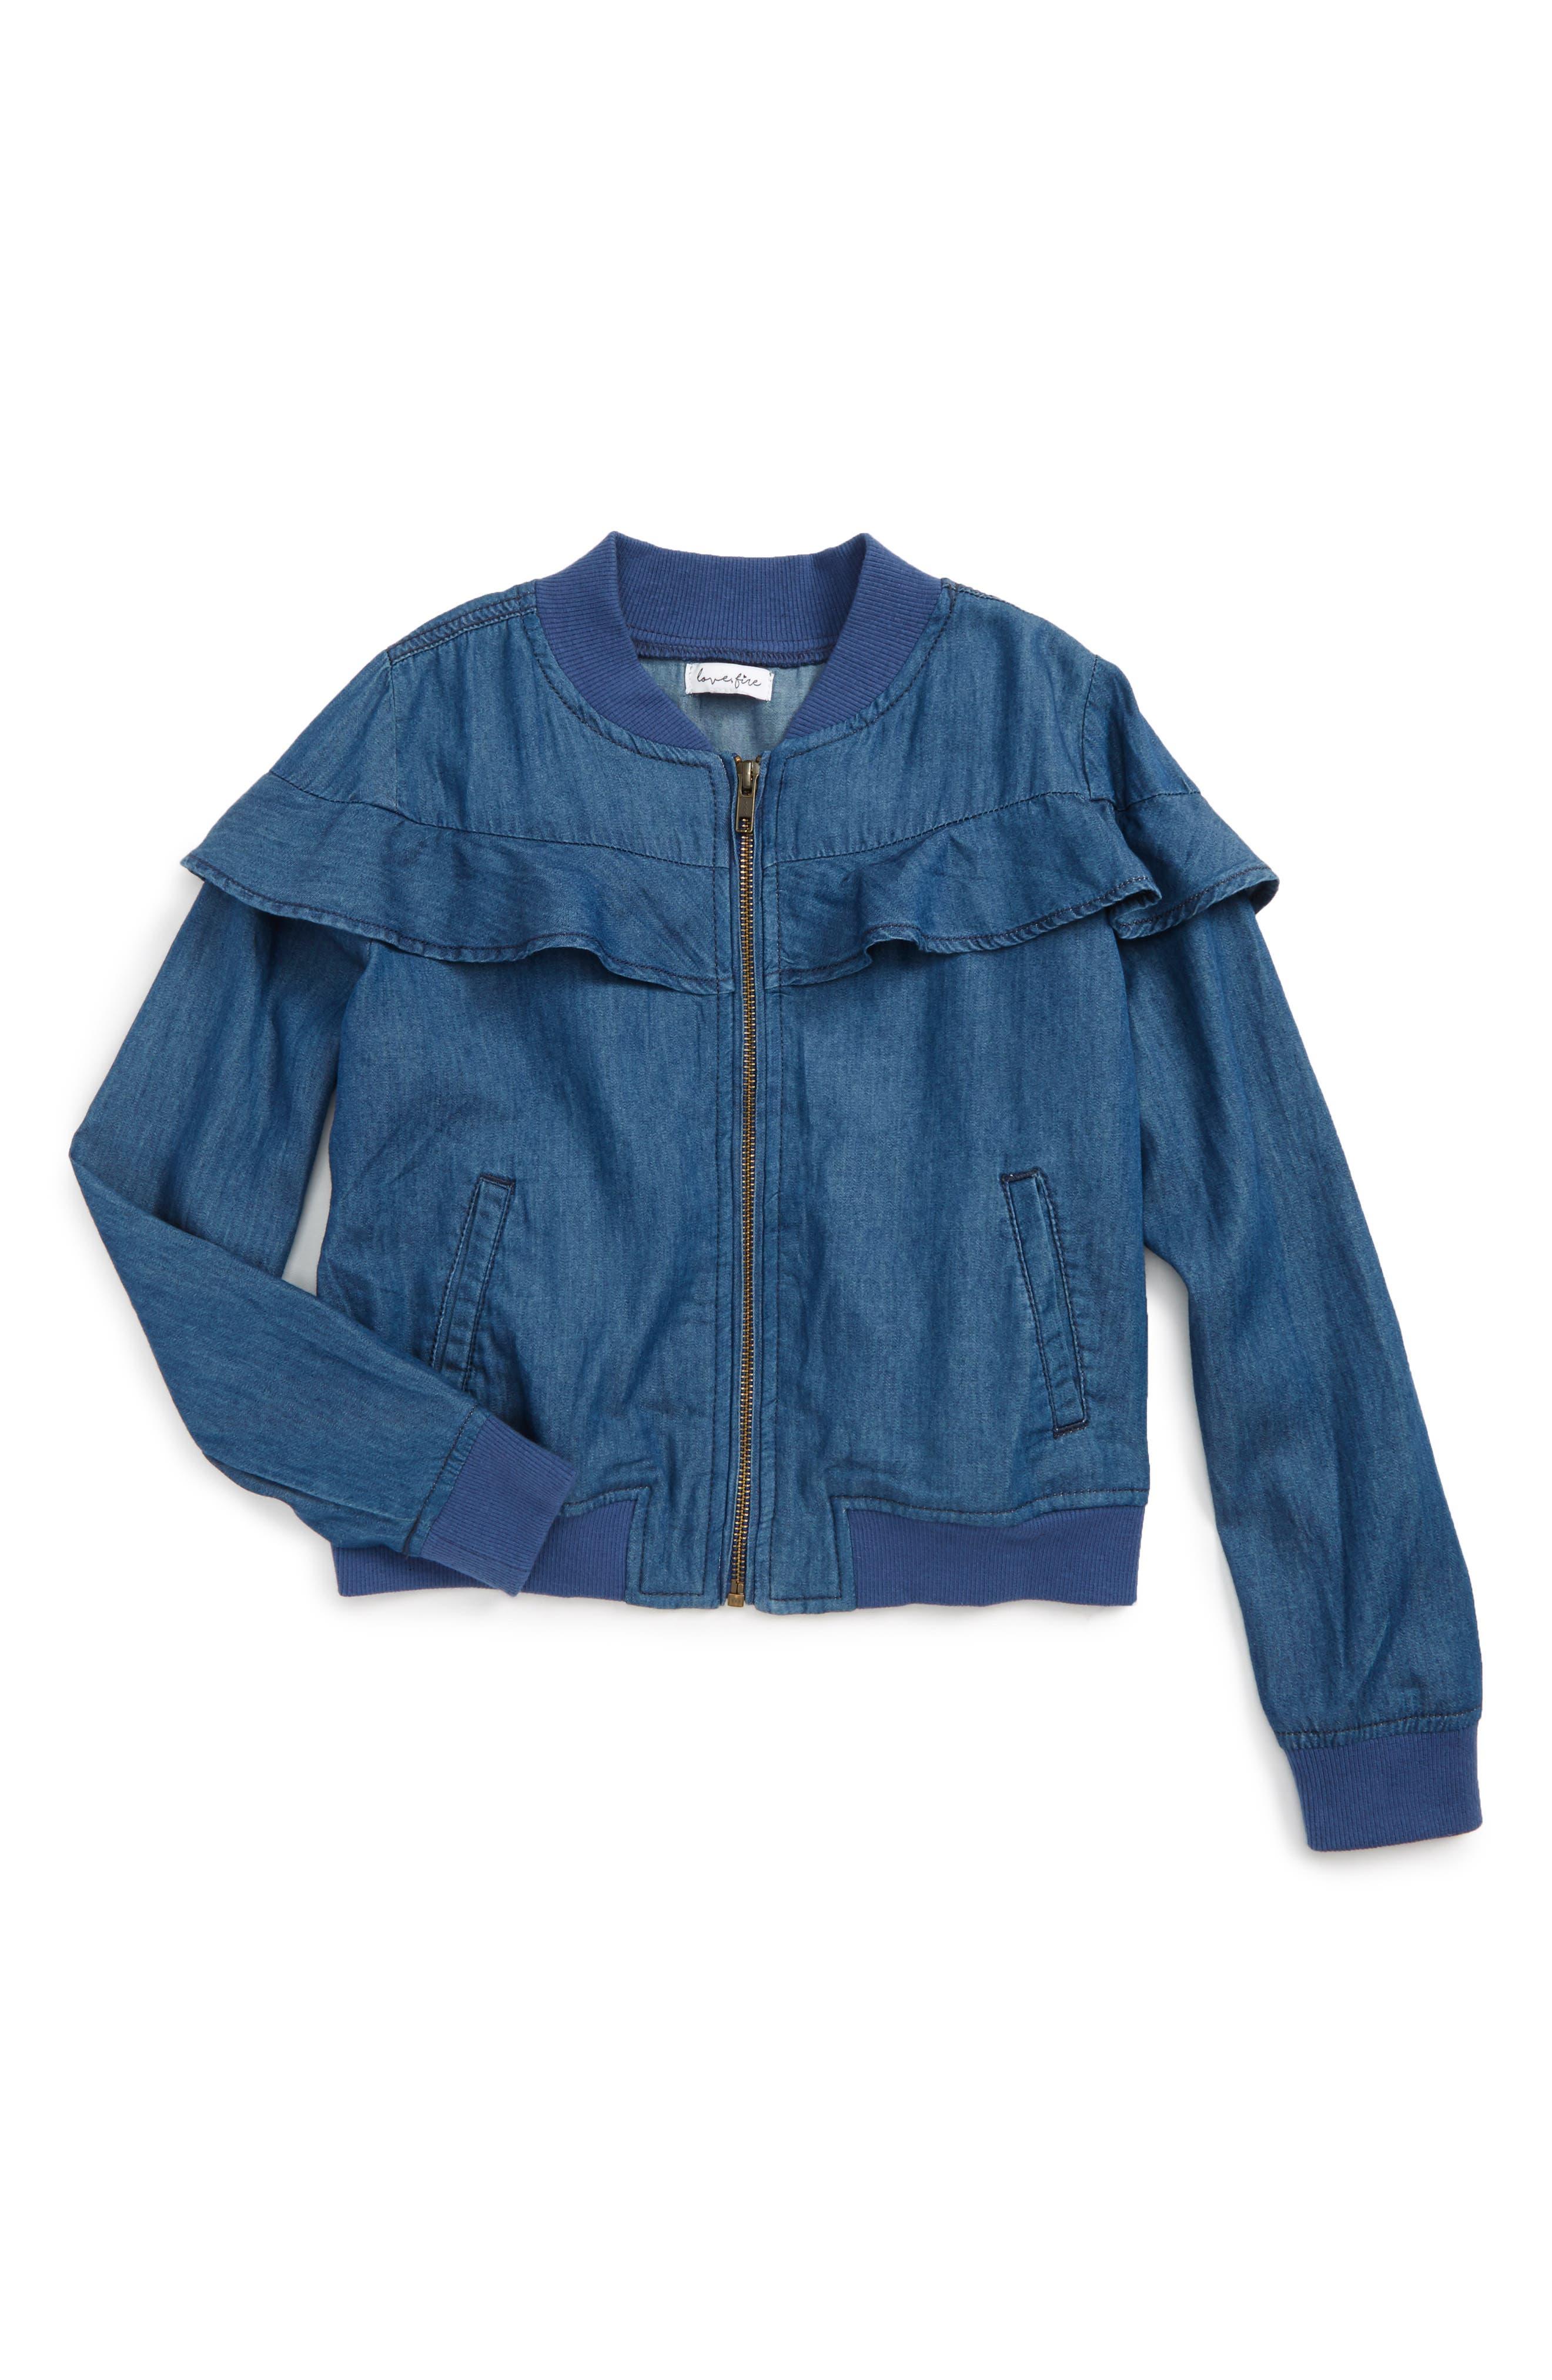 Ruffle Denim Jacket,                         Main,                         color, Host Wash Blue